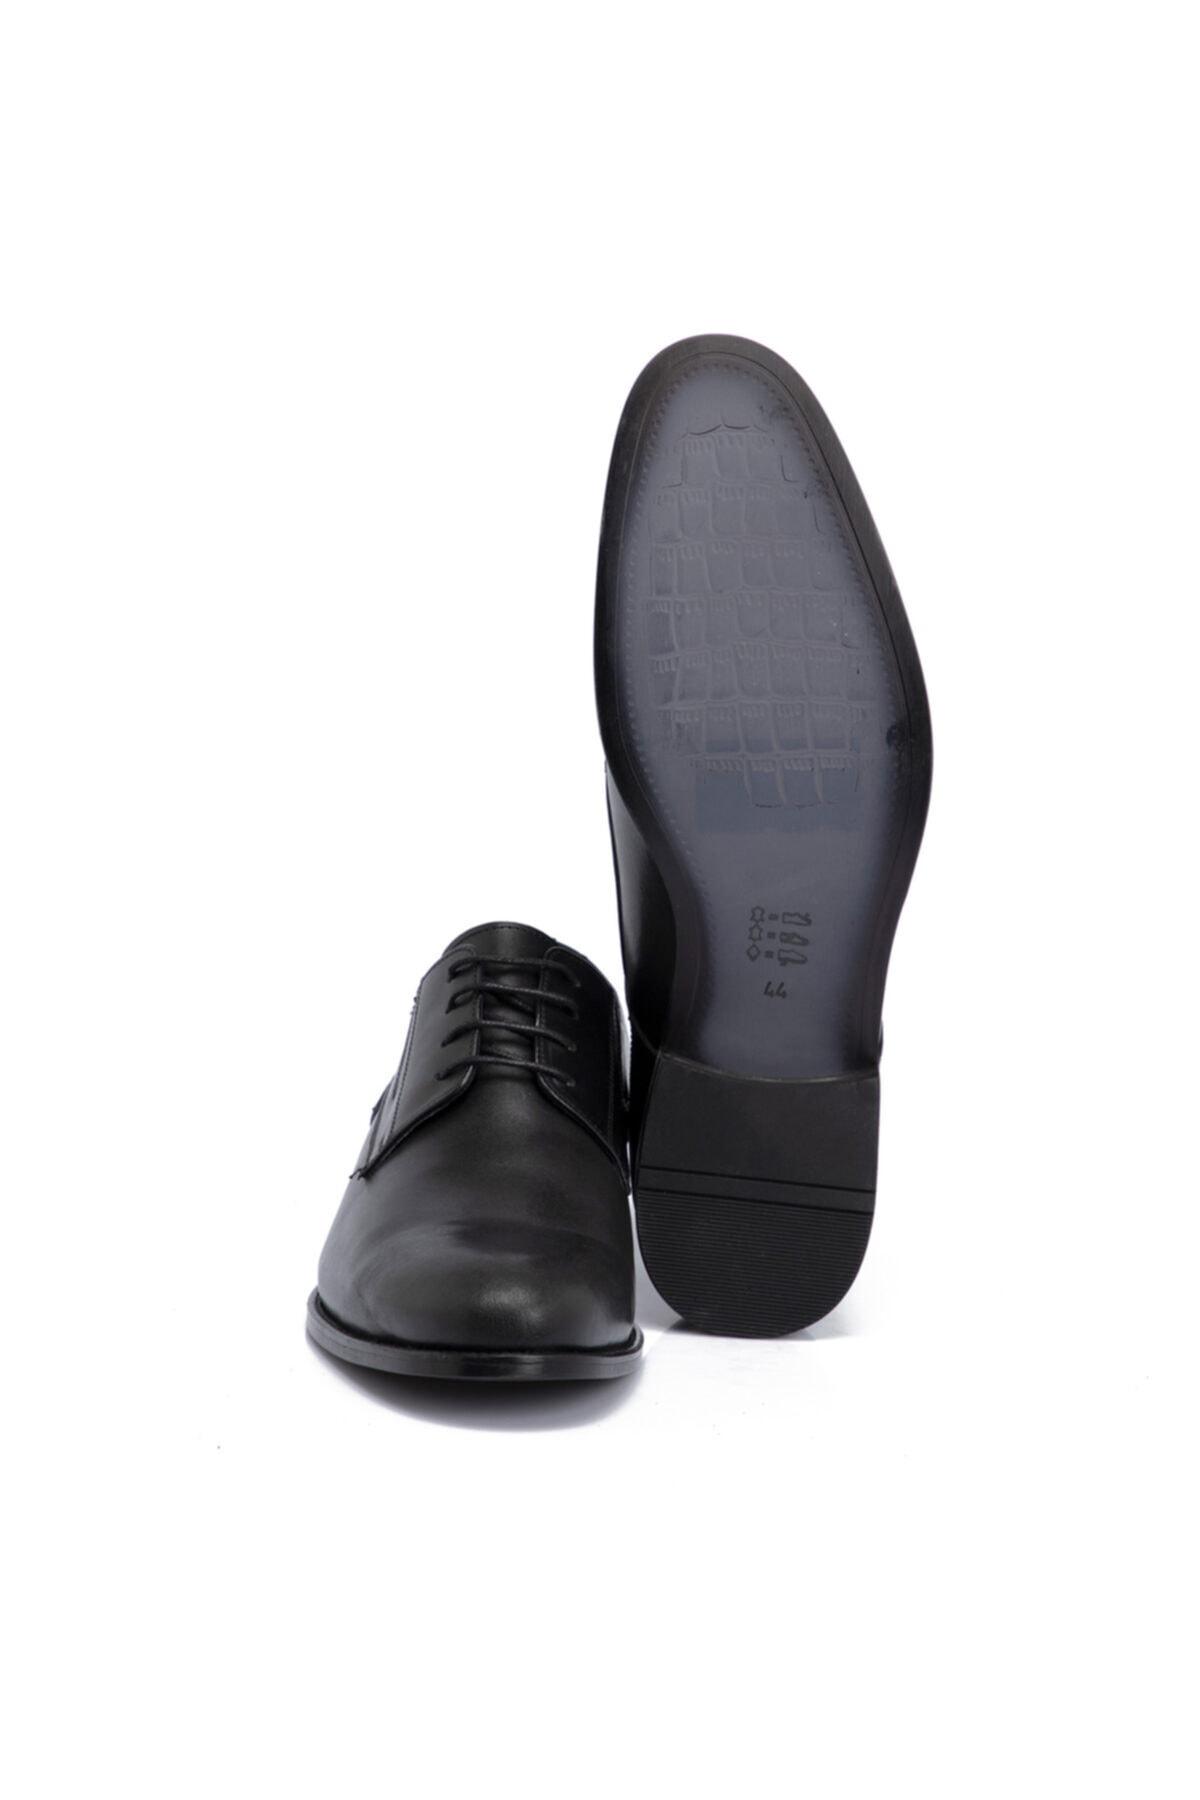 Tergan Siyah Deri Erkek Ayakkabı 54330a43 2